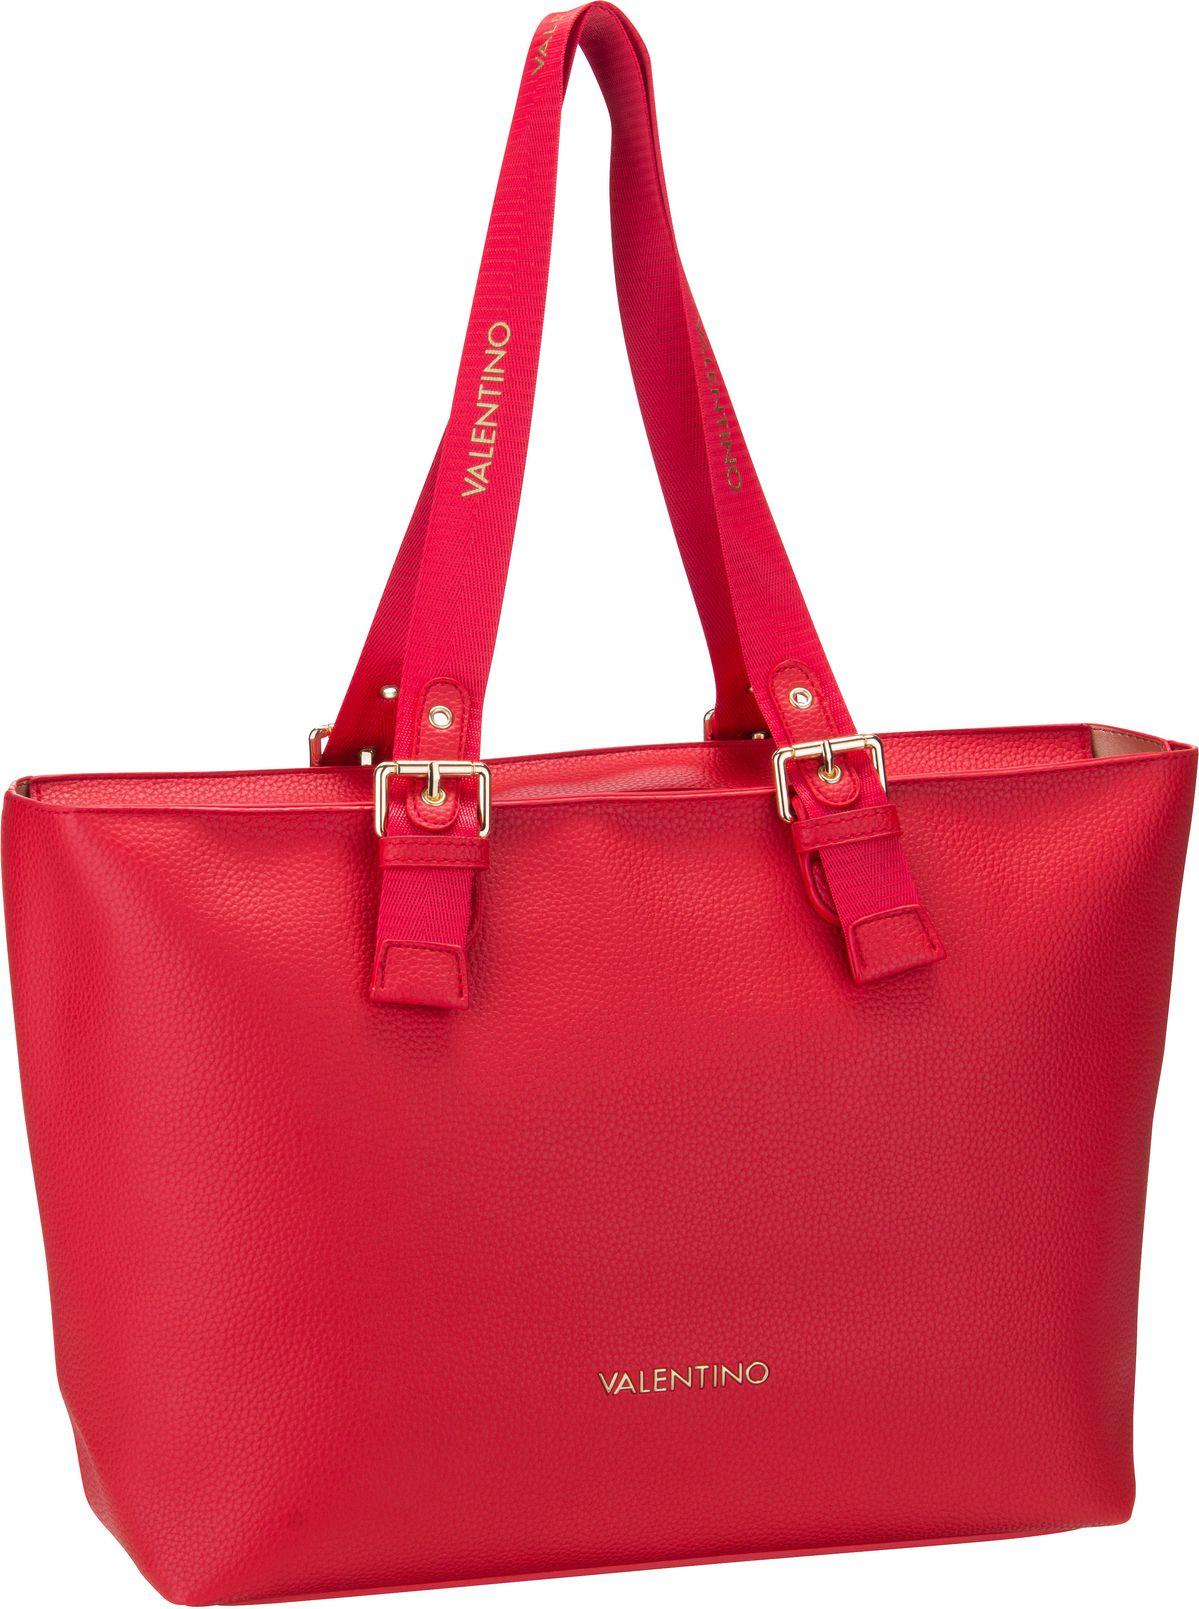 Bags Handtasche Babar Shopping Z01 Rosso